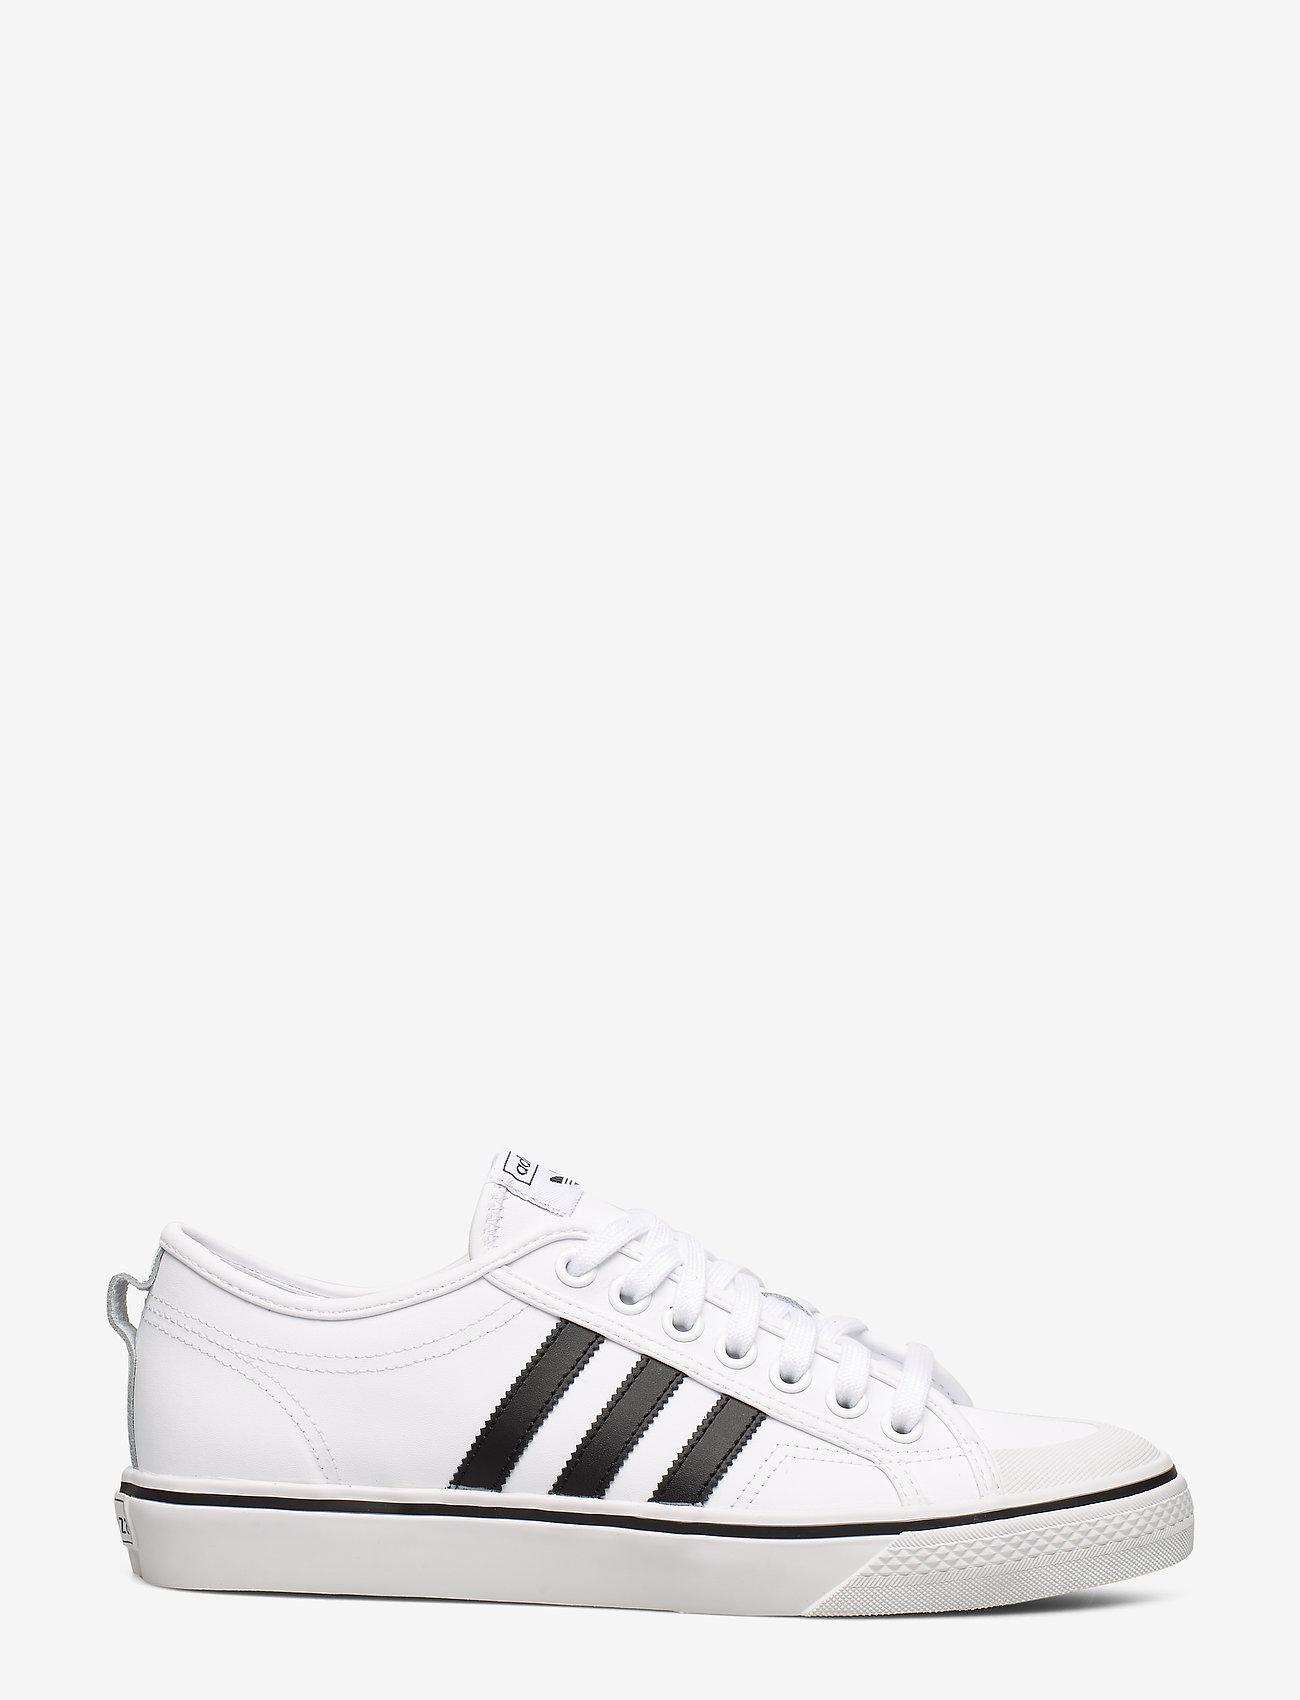 Nizza (Ftwwht/cblack/crywht) - adidas Originals yihuGQ